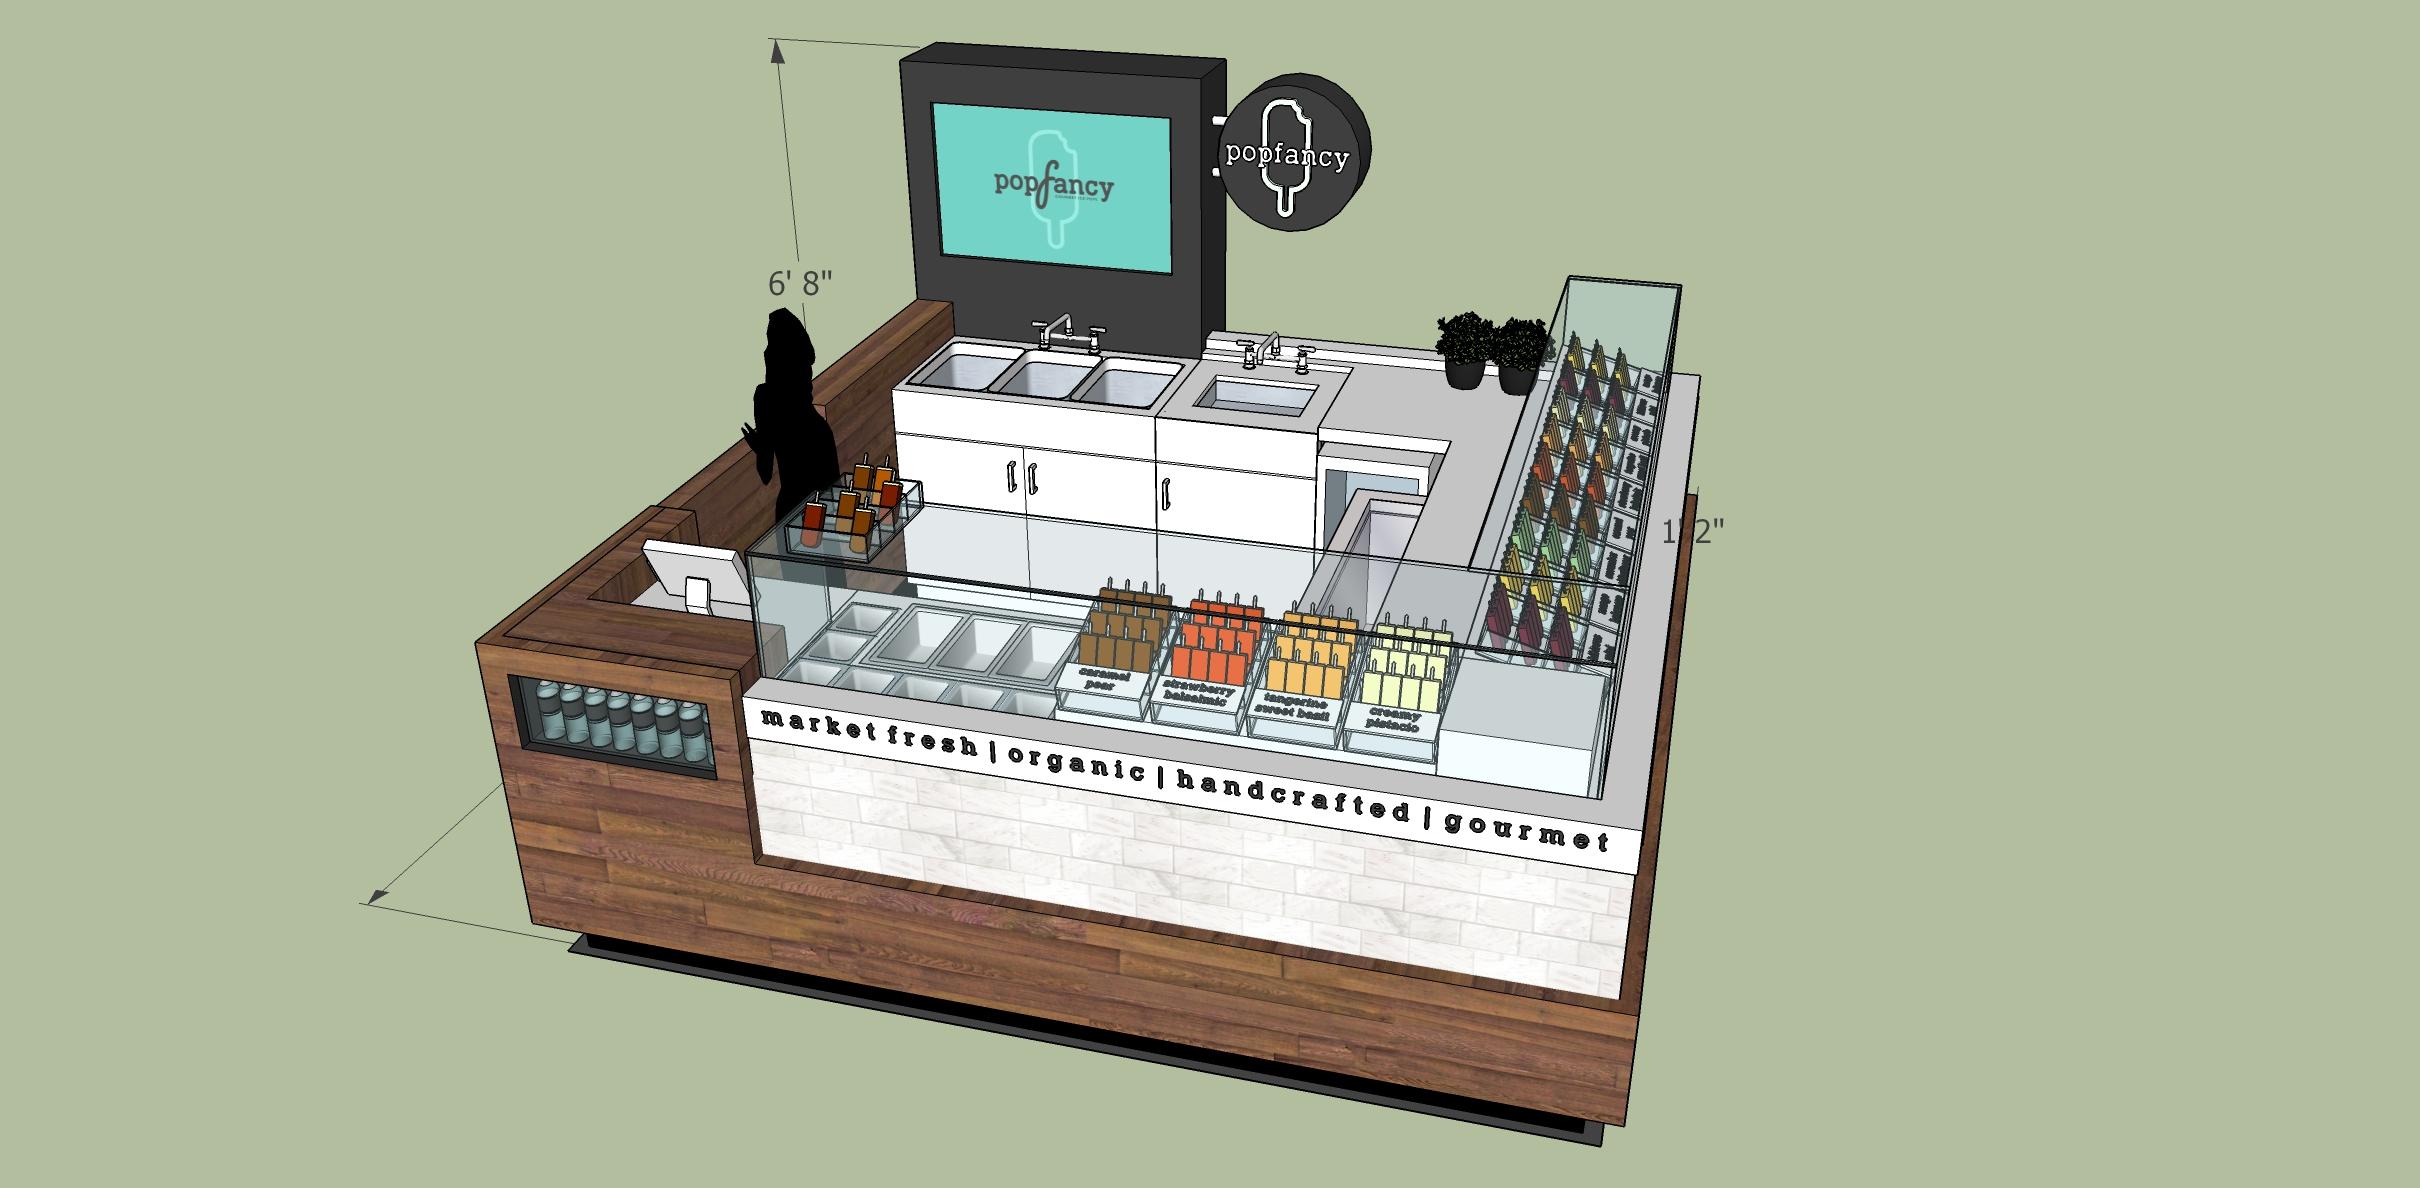 Popfancy Kiosk Design